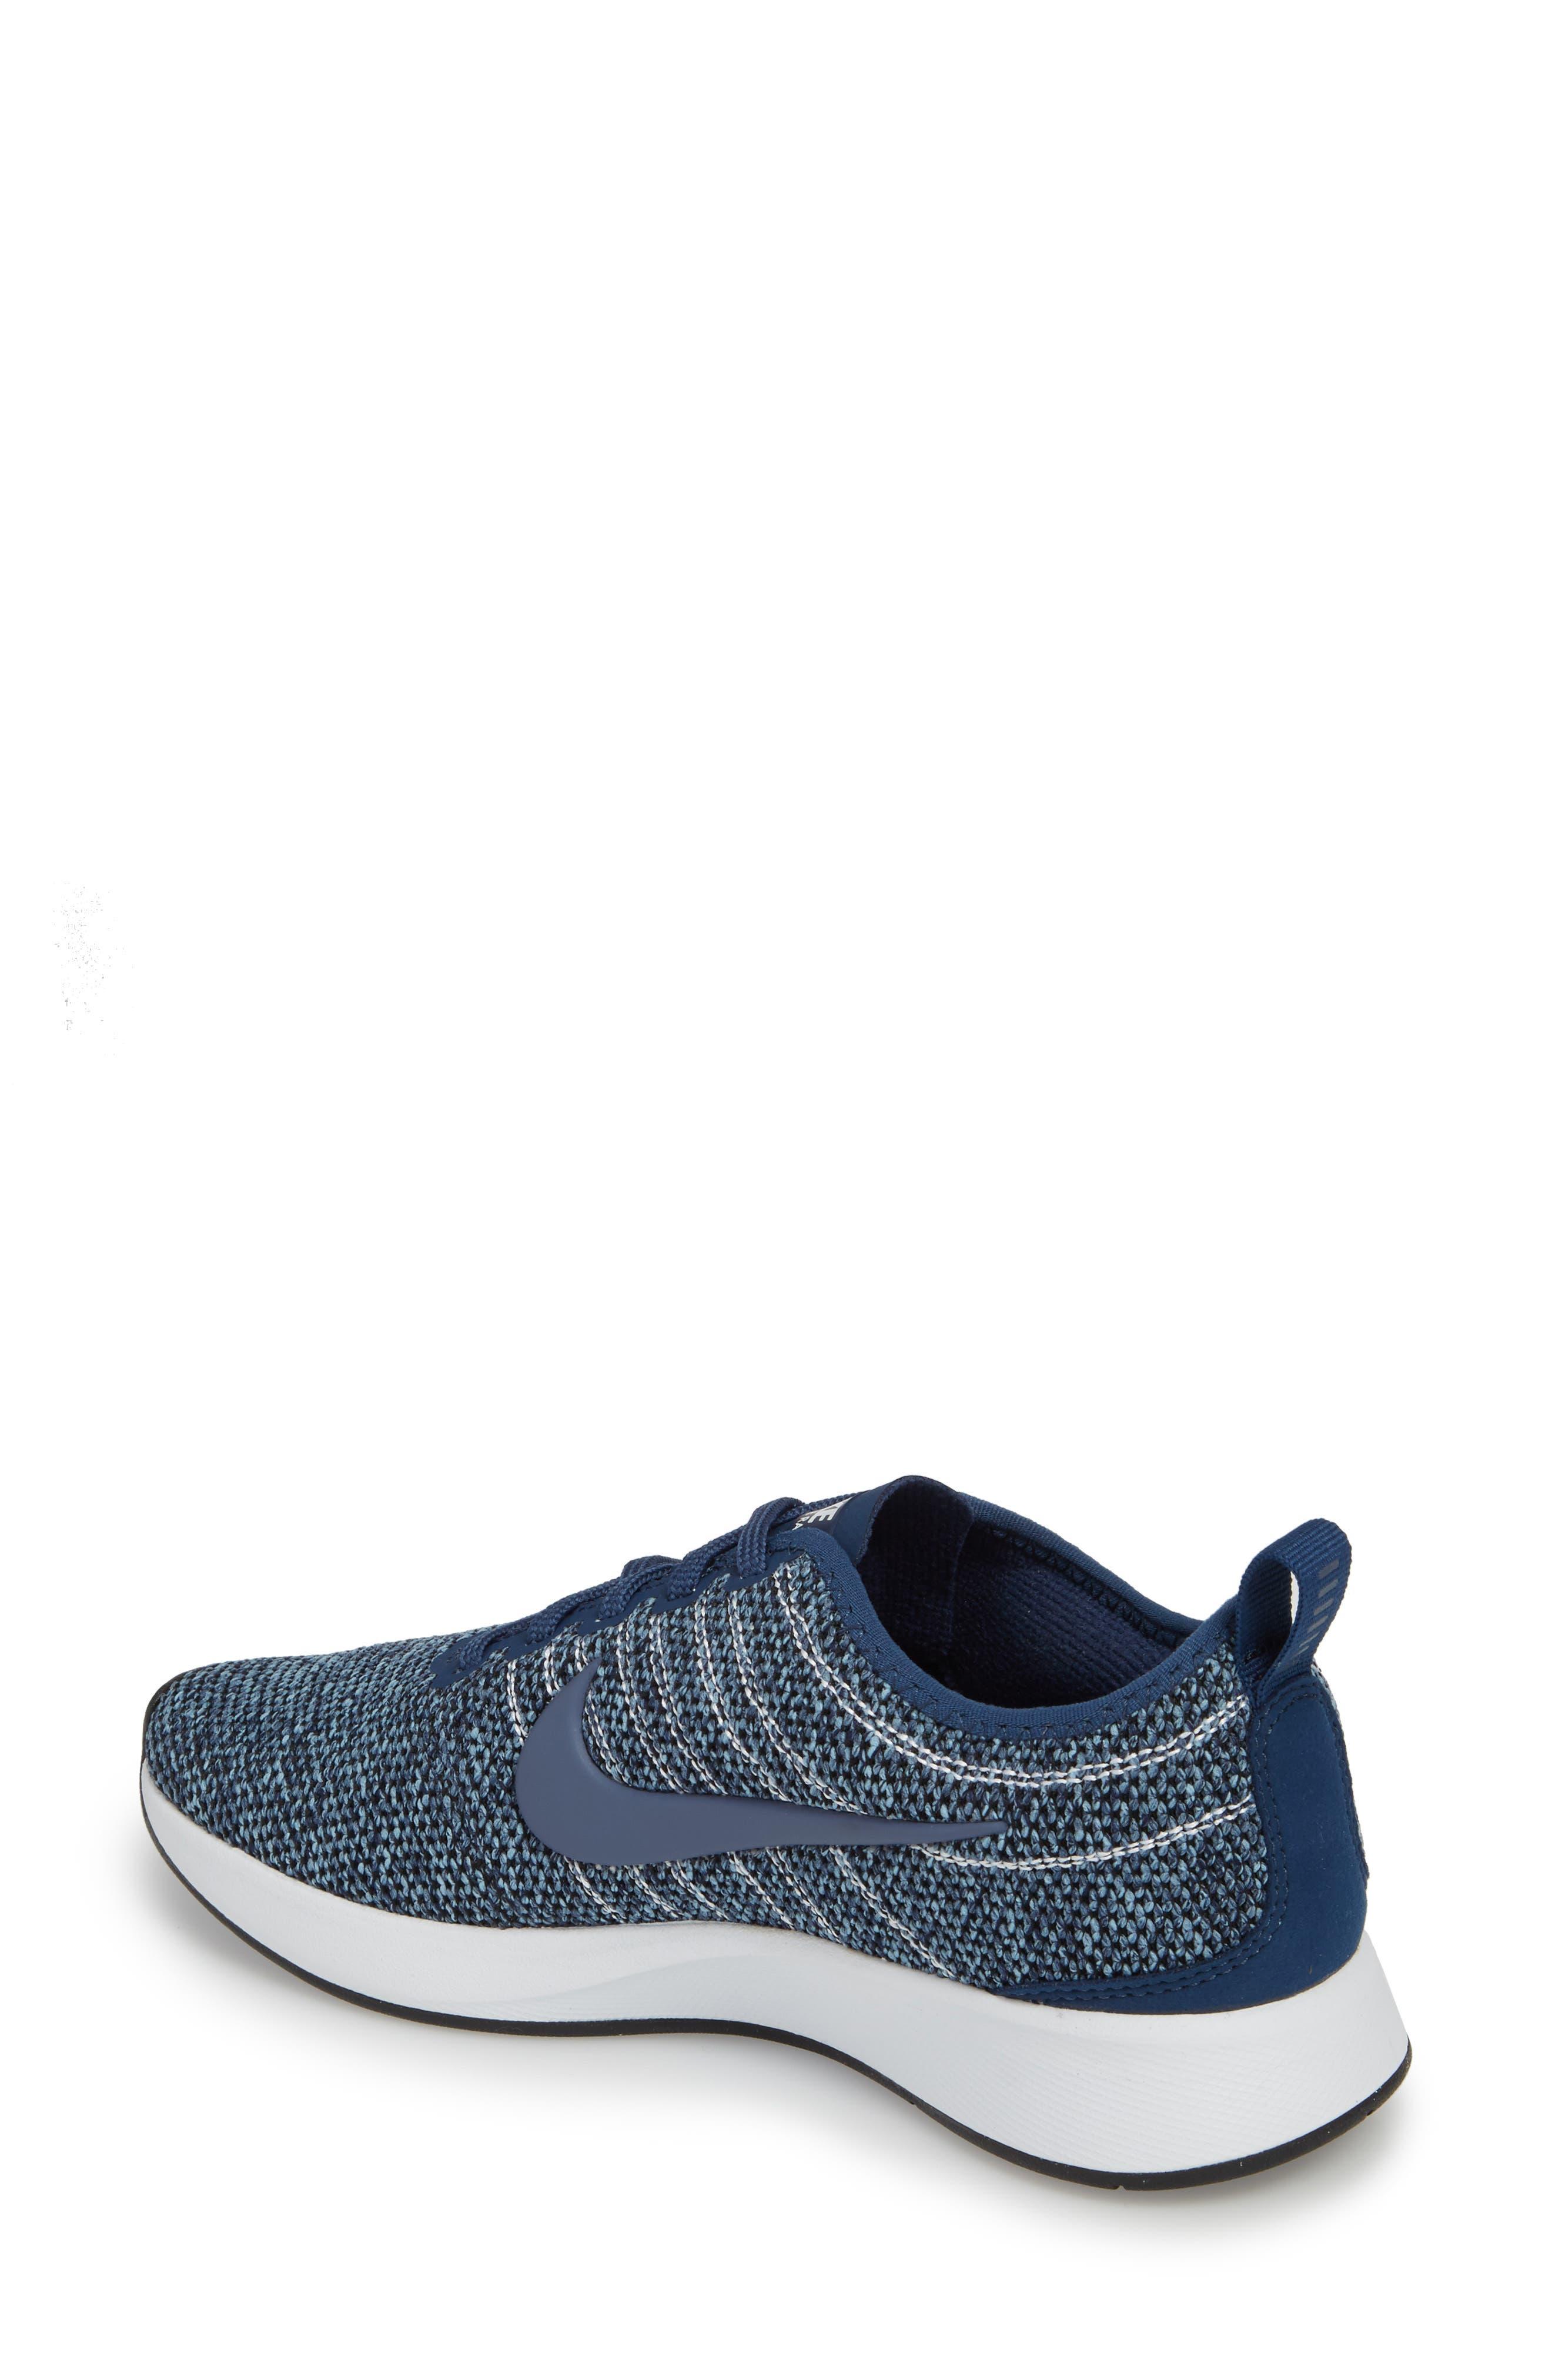 Dualtone Racer PRM Sneaker,                             Alternate thumbnail 6, color,